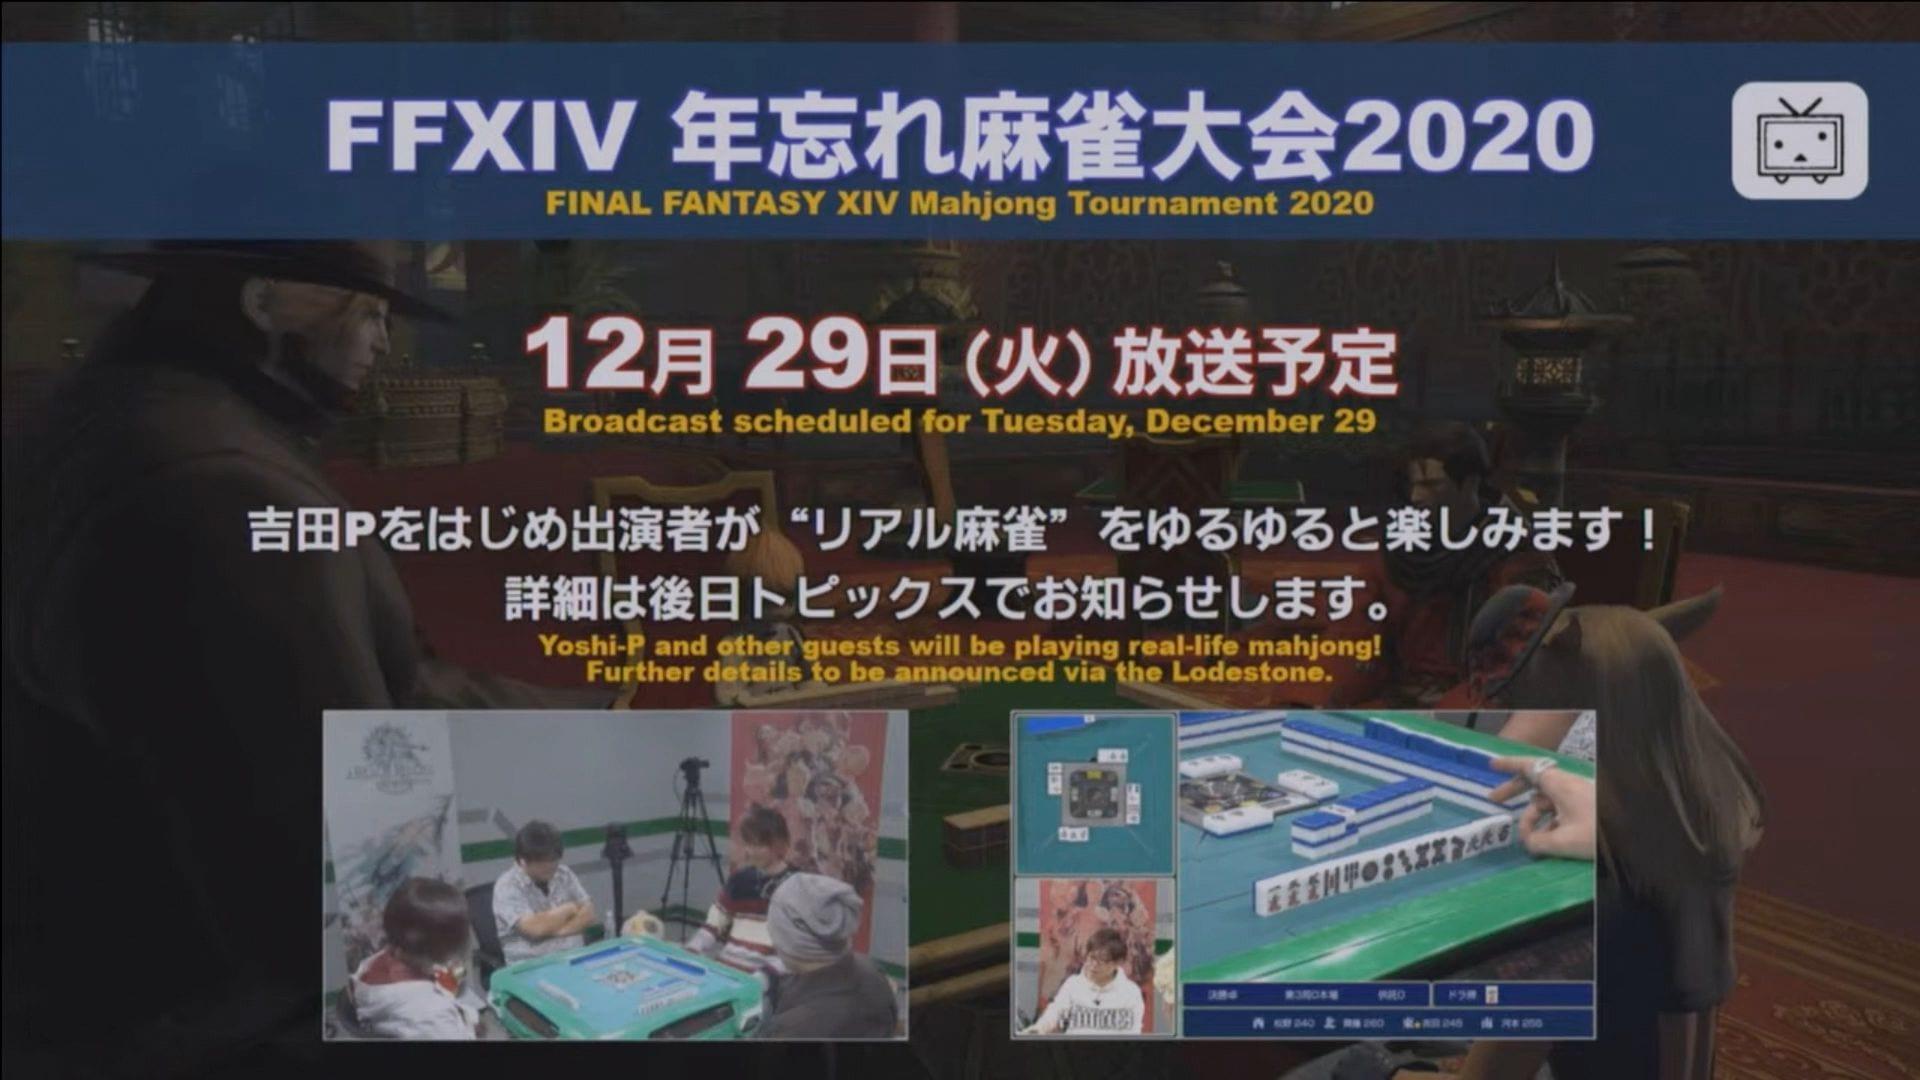 Final-Fantasy-XIV-Screenshot-2020-11-27-15-19-16.jpg?ssl=1